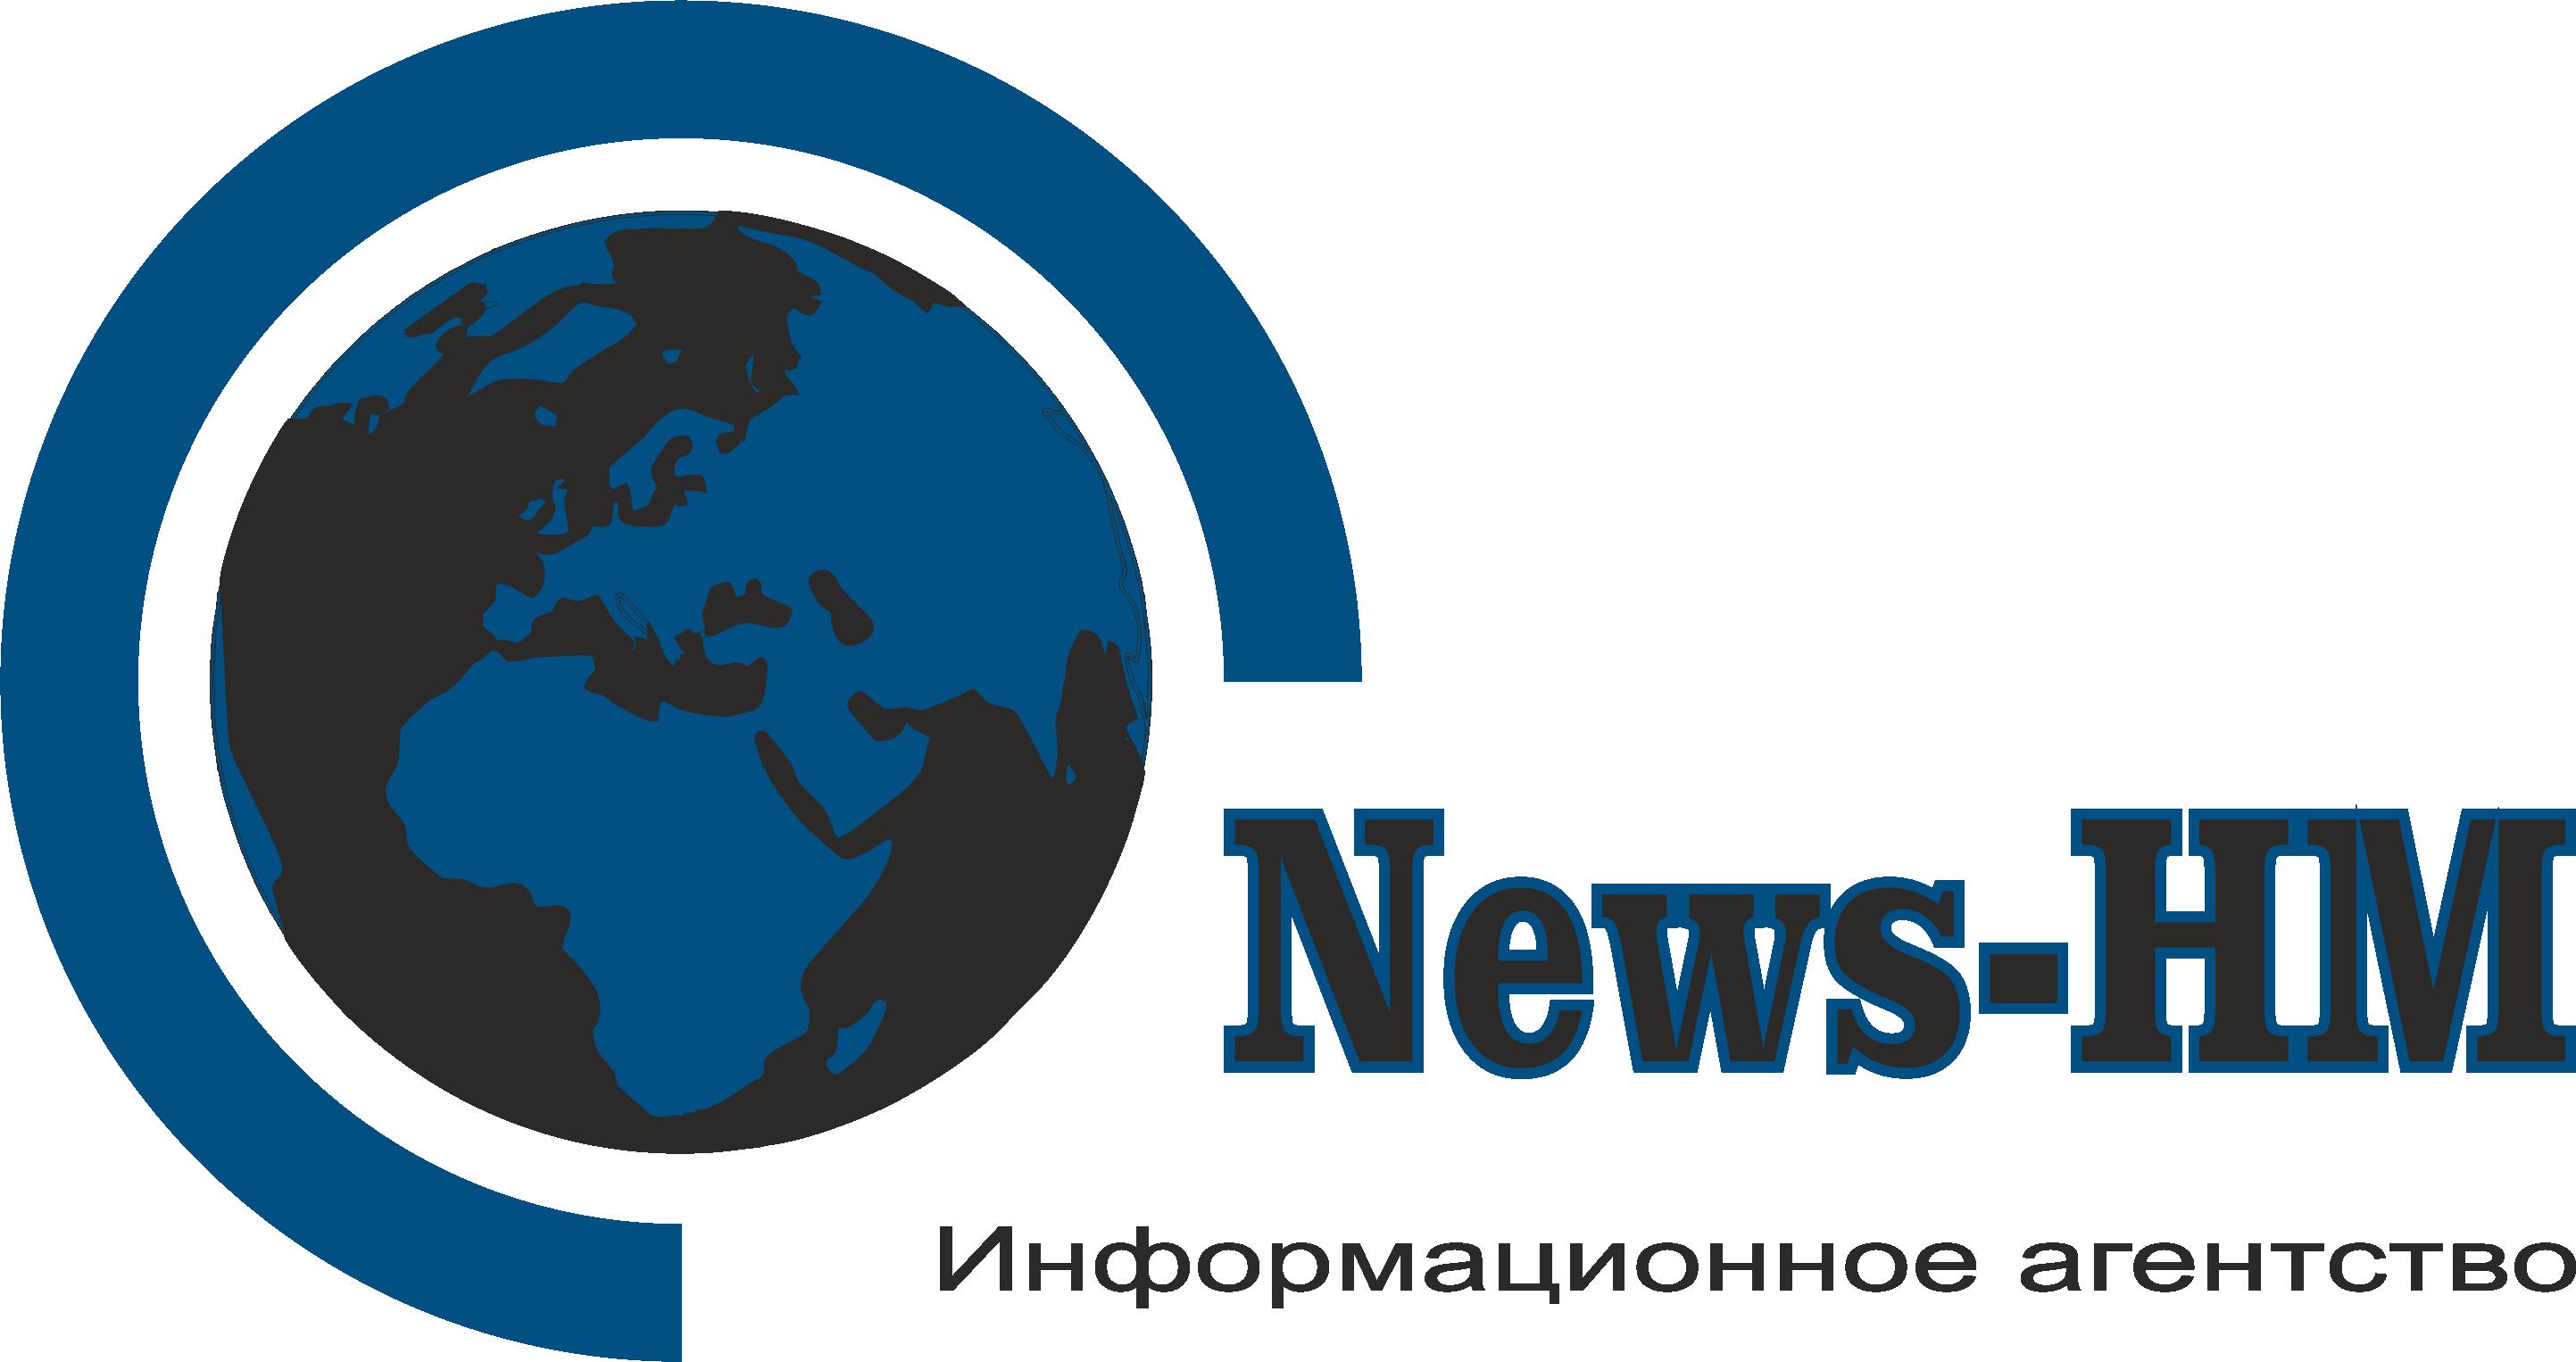 Логотип для информационного агентства фото f_7315aa2b16257616.png